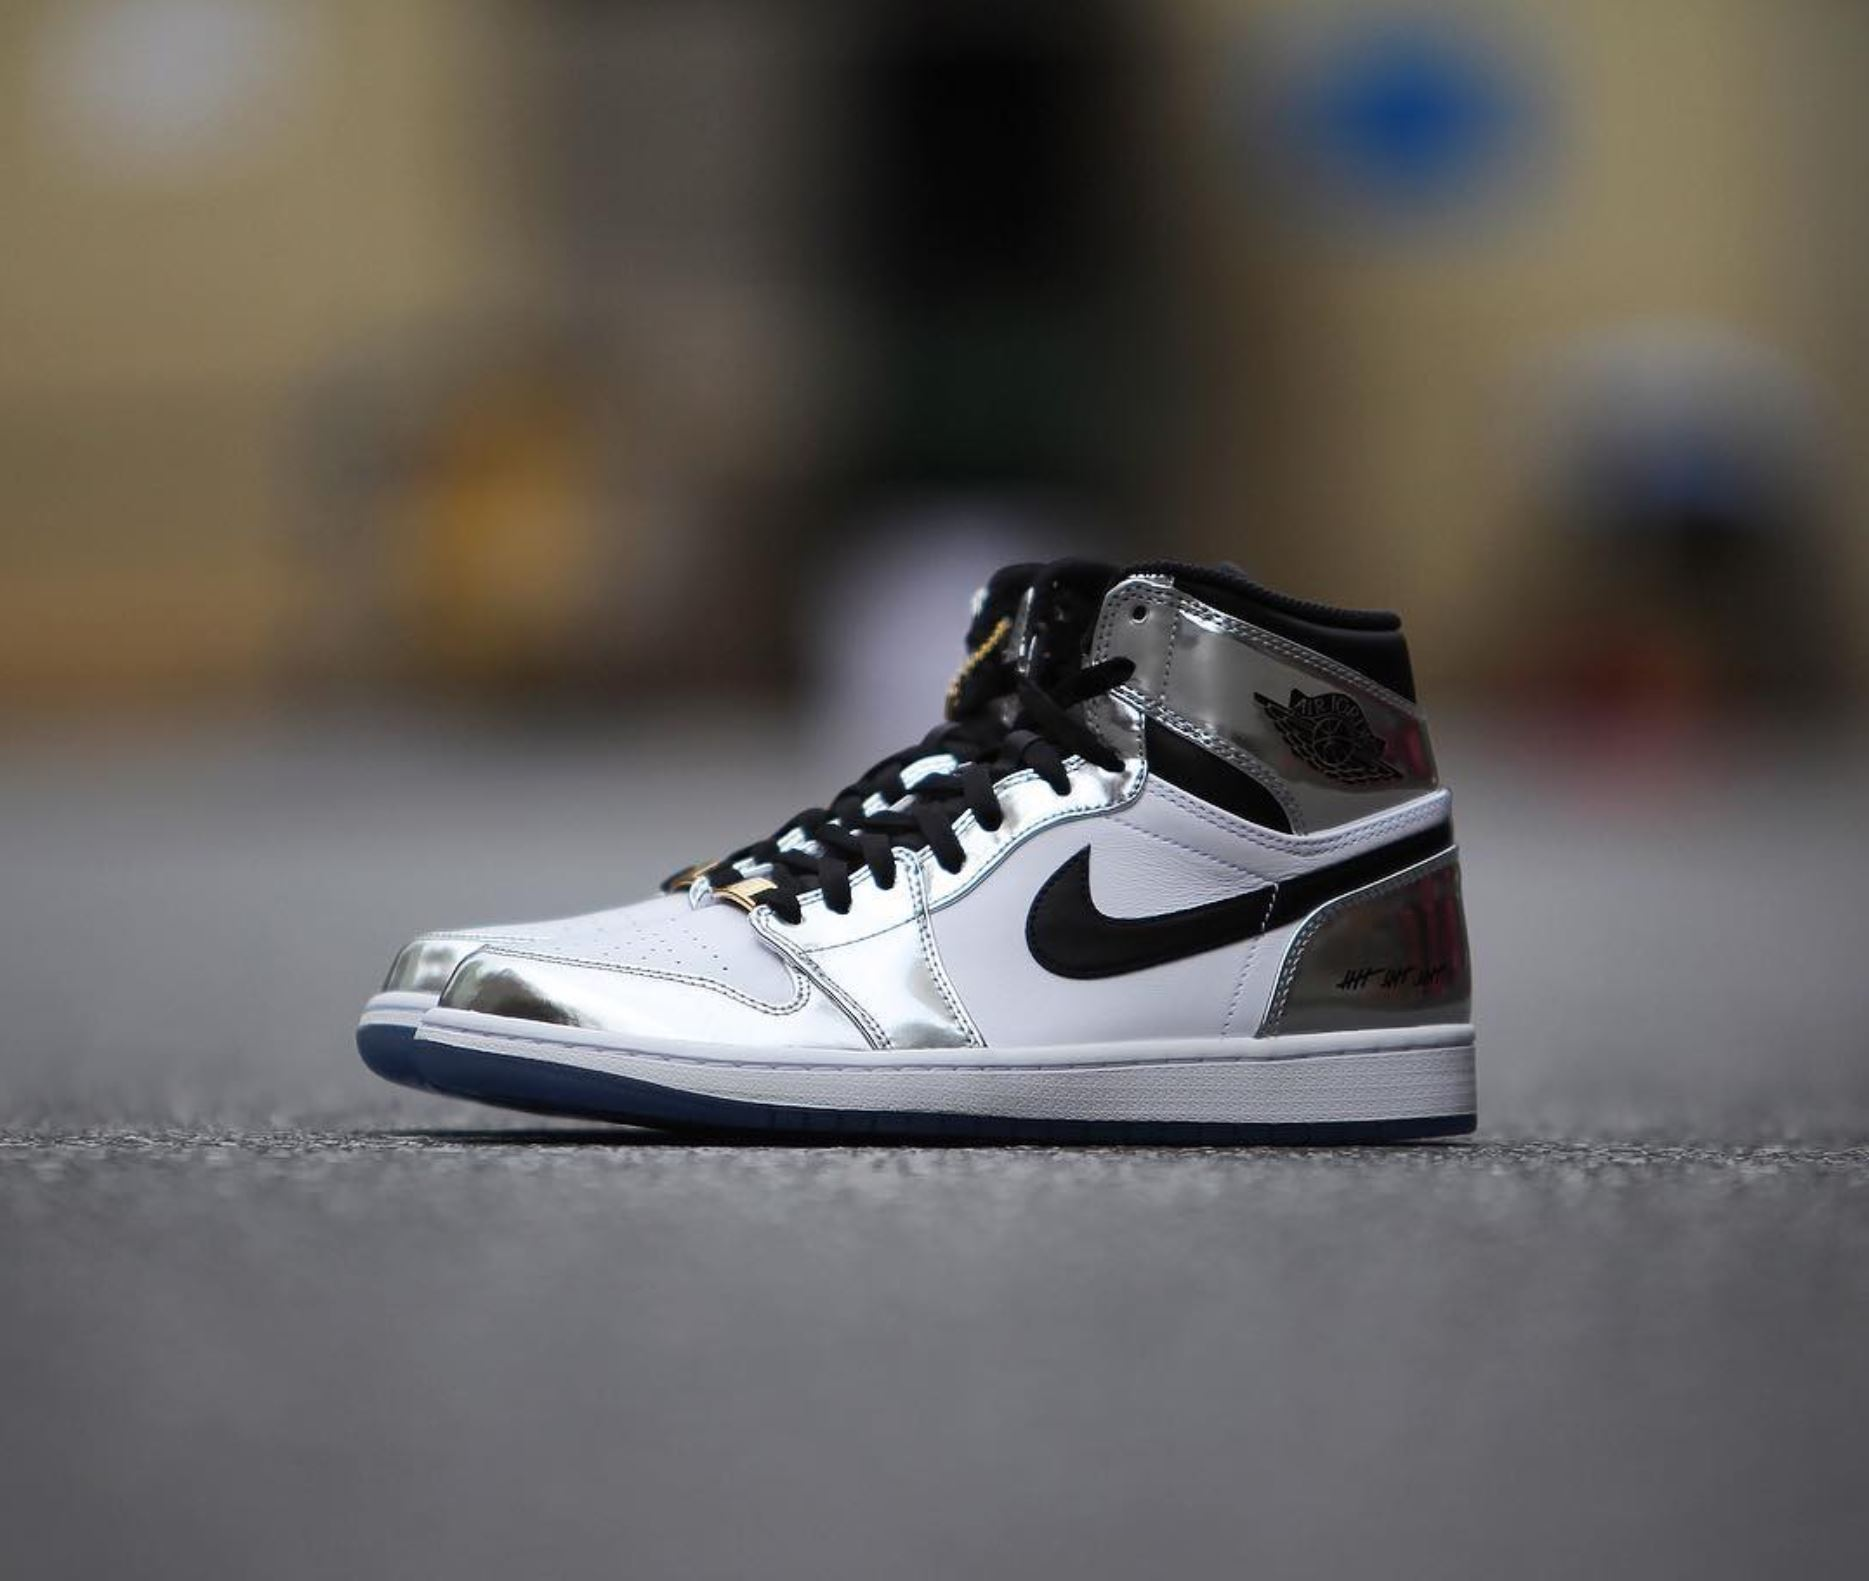 new product 1fdaa a0255 kawhi leonard air jordan 1 pass the torch · Basketball   Jordan Brand    Kicks On Court ...